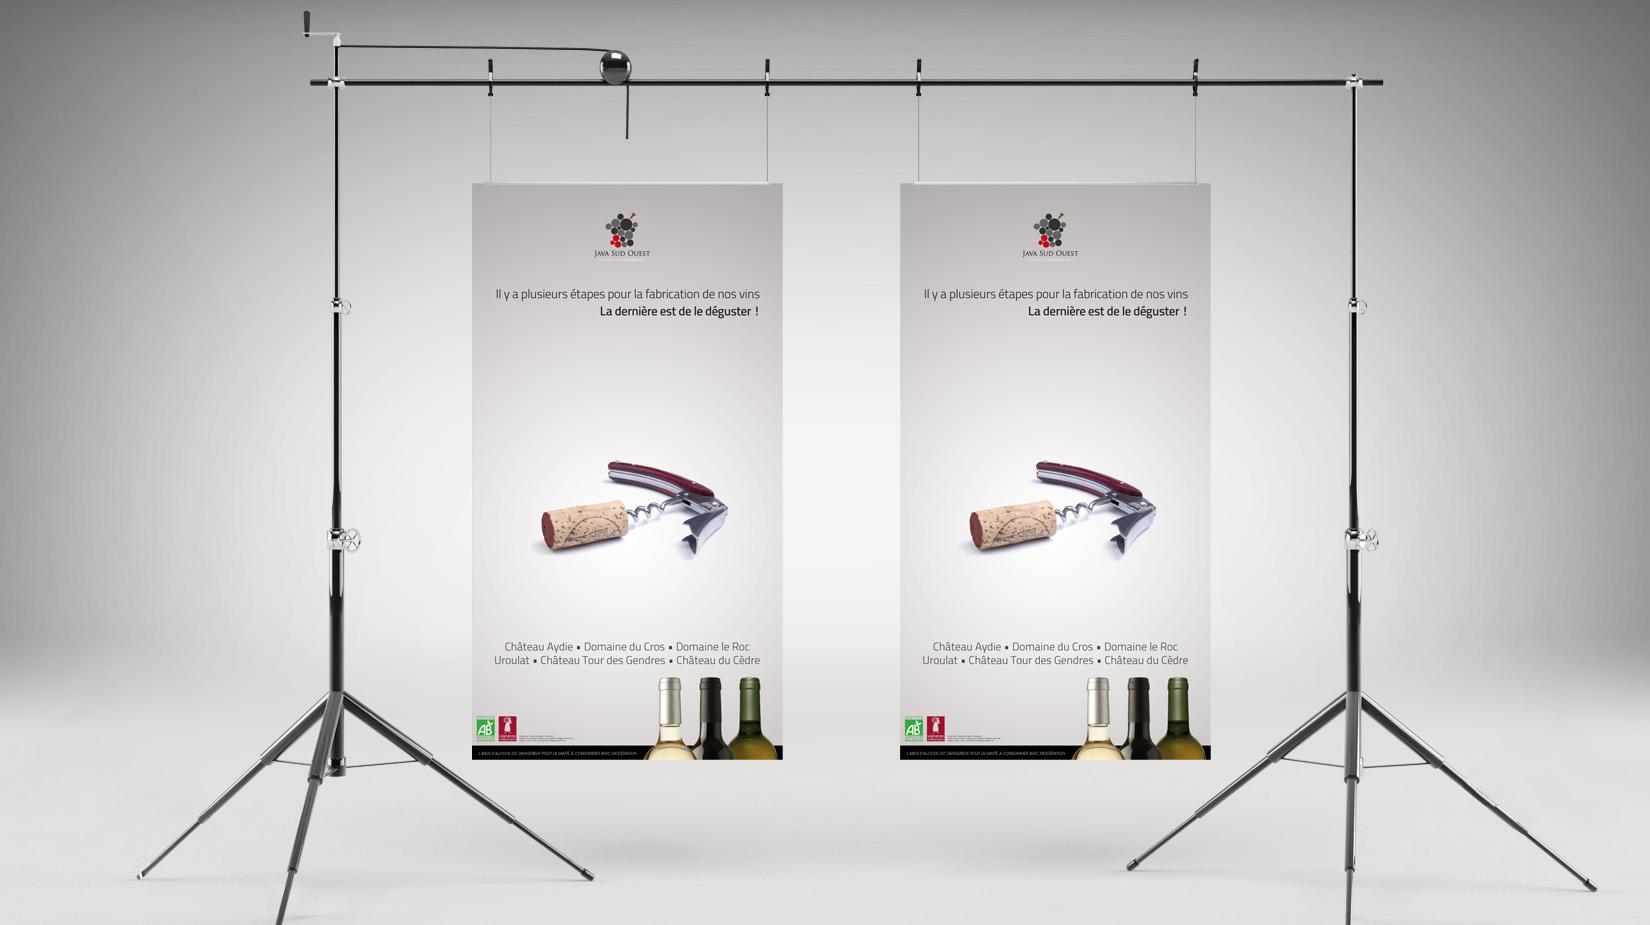 Campagne publicitaire : Java Sud Ouest